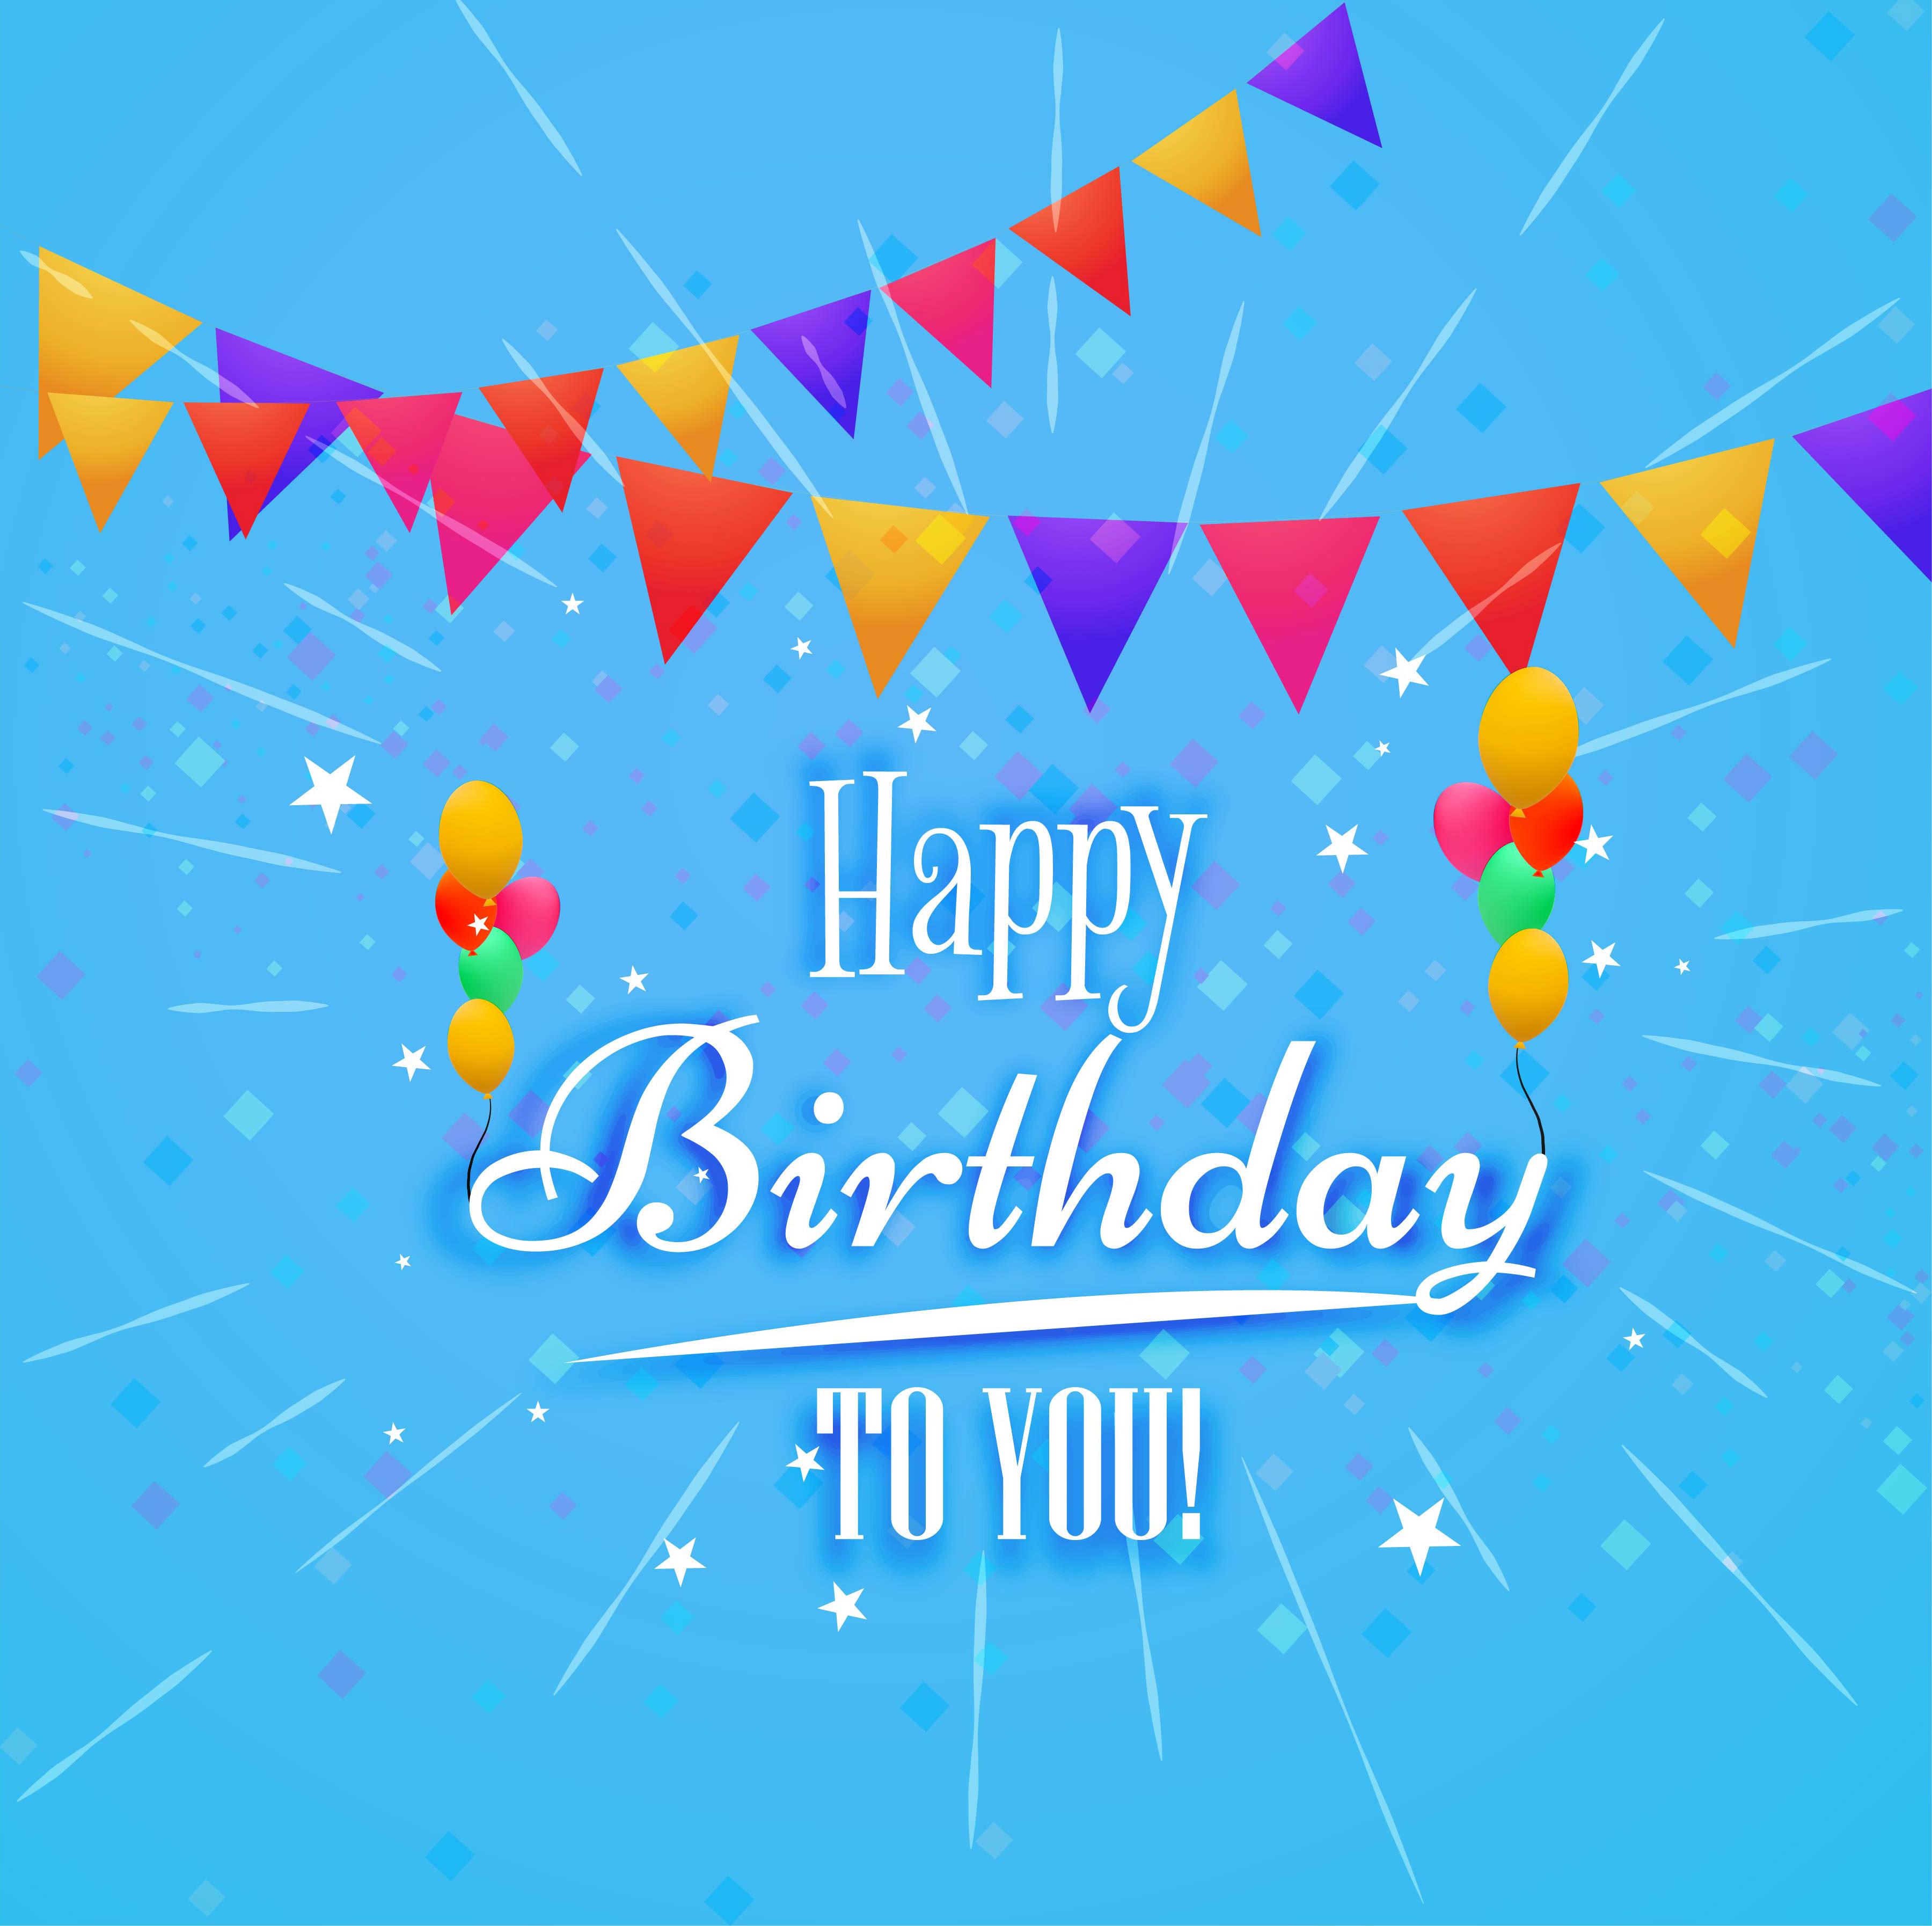 Happy Birthday Card Decorative Background